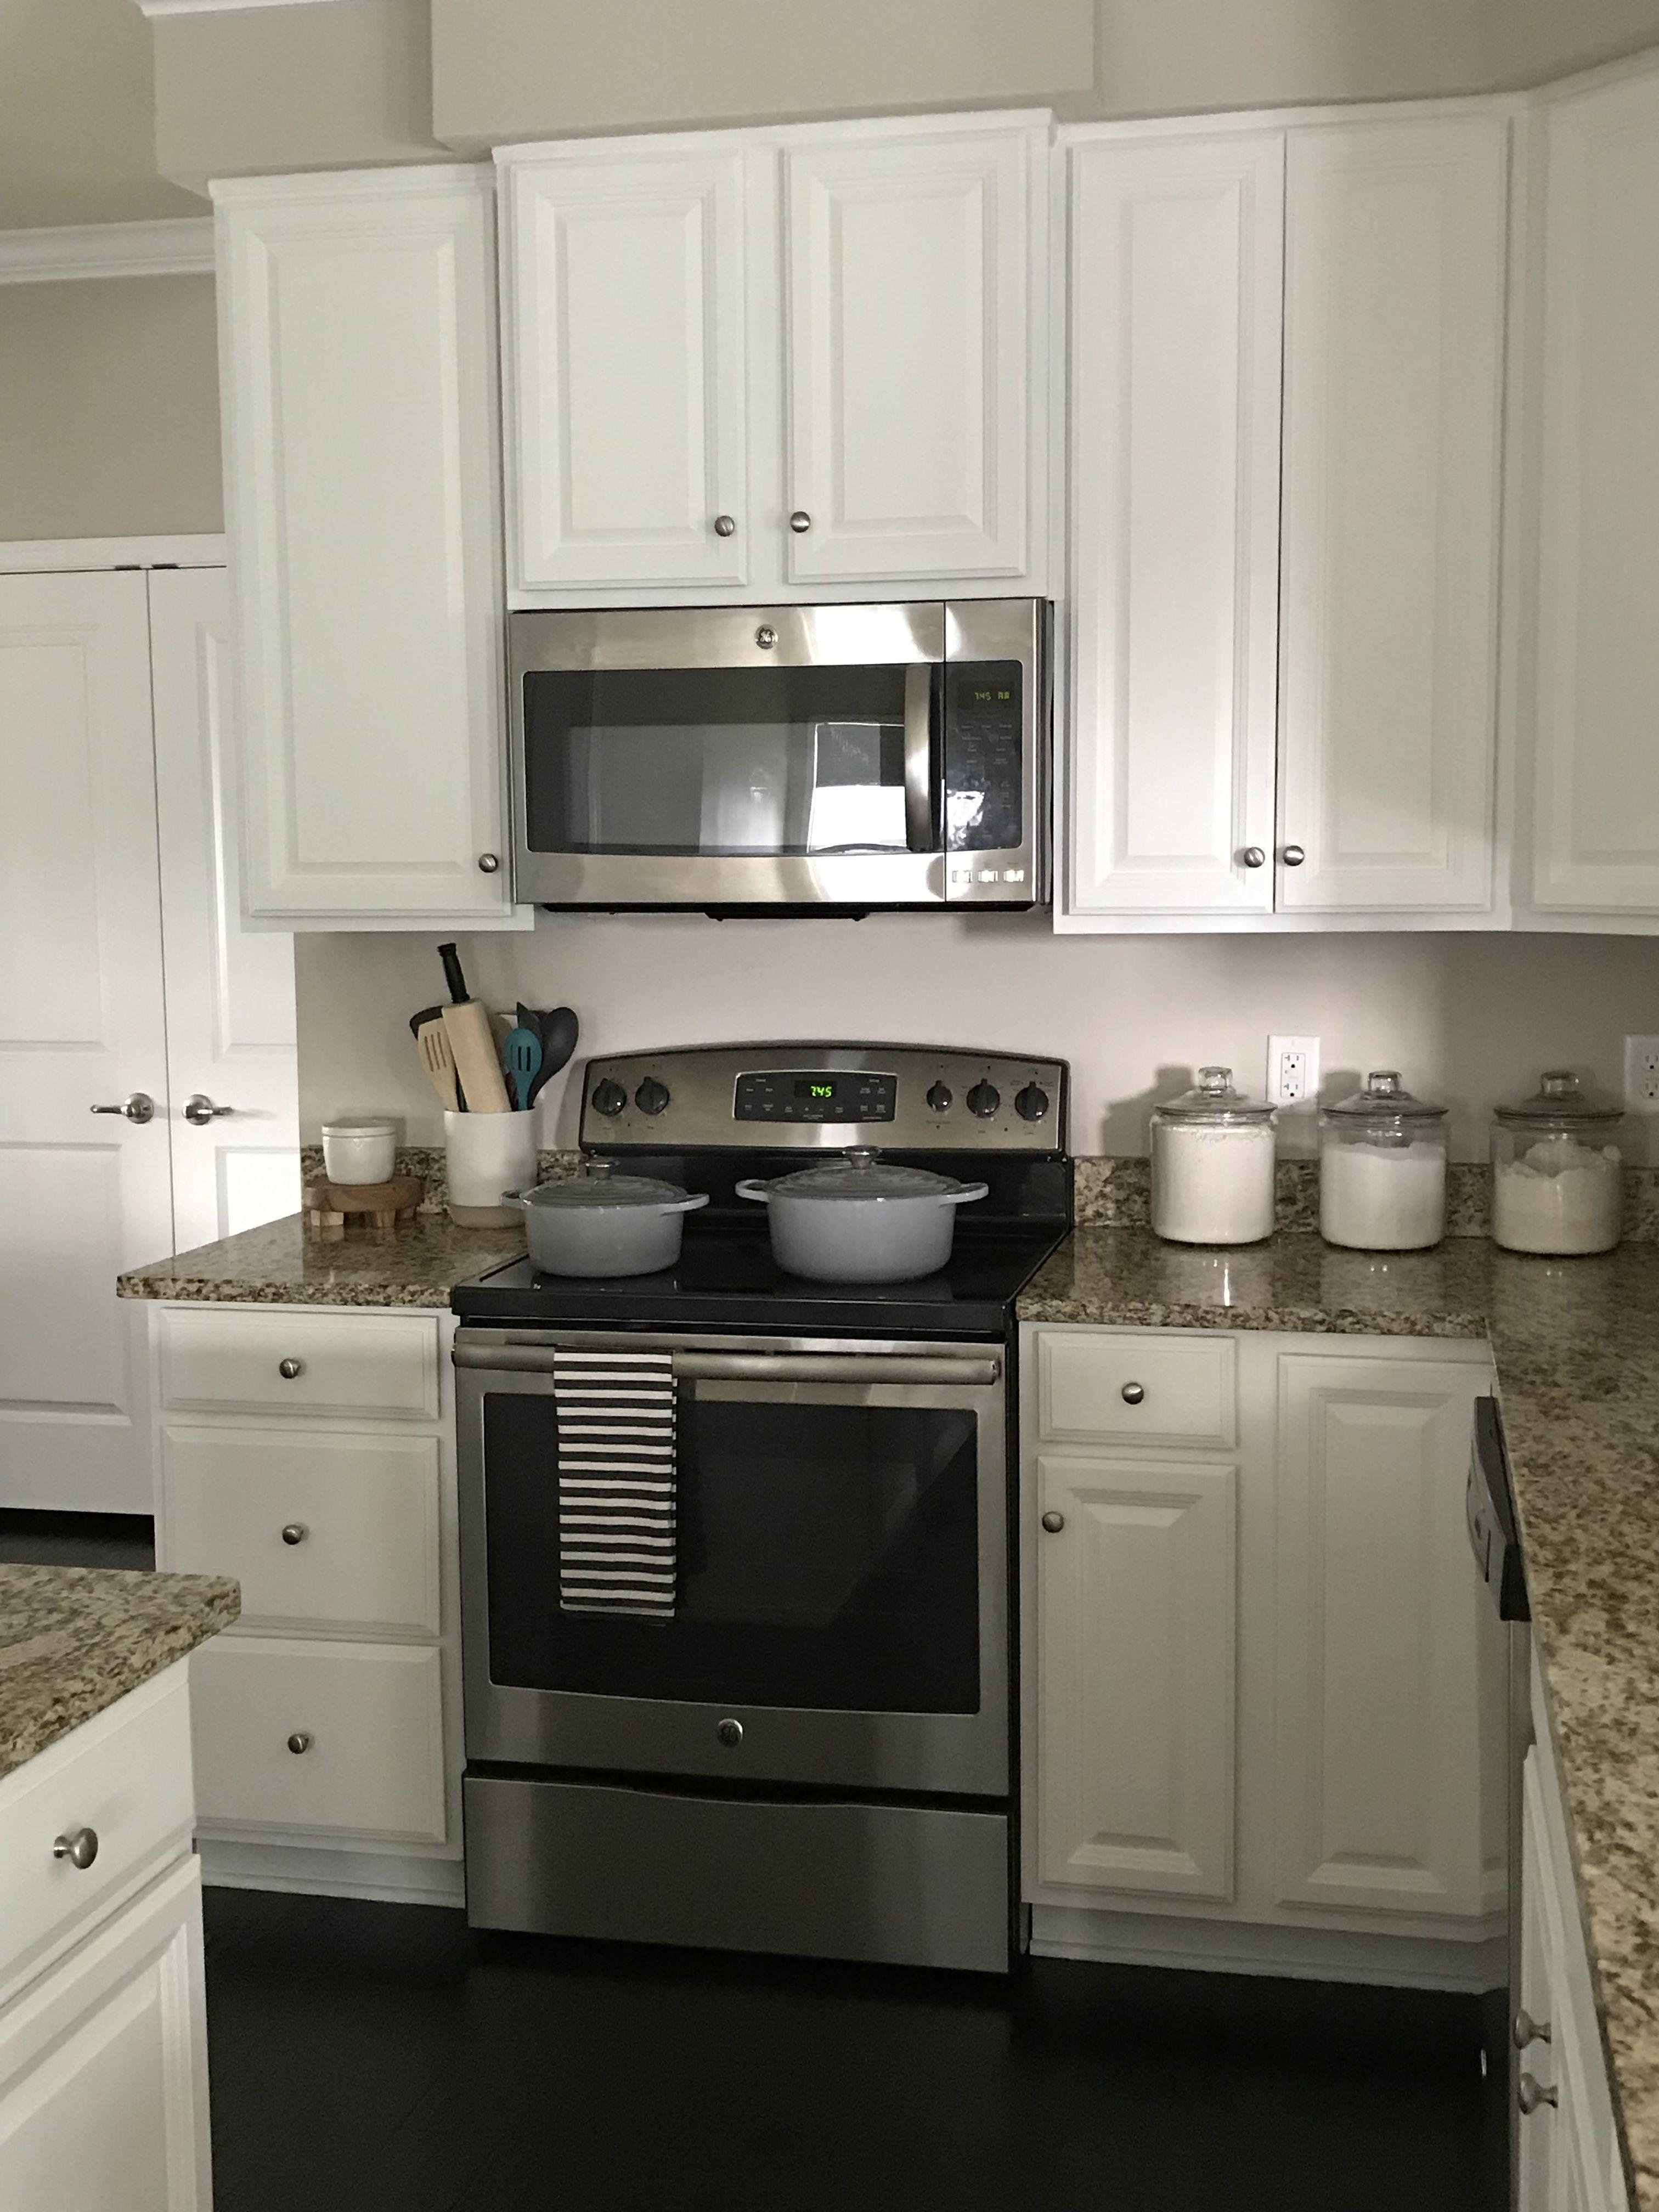 White kitchen cabinets Valspar Swiss coffee | Painting ...